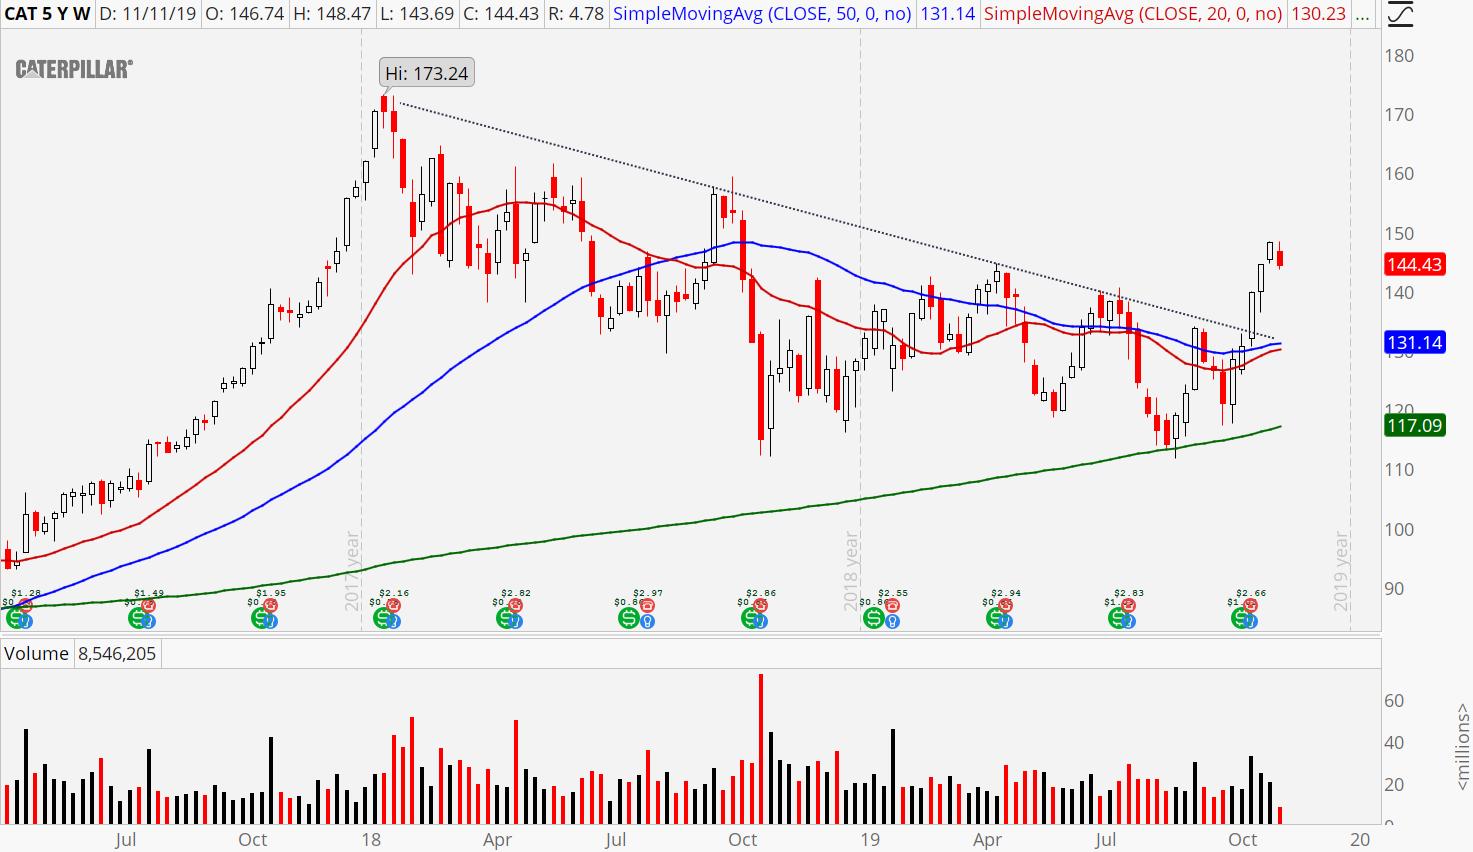 3 Industrial Stocks to Buy: Caterpillar (CAT) stock